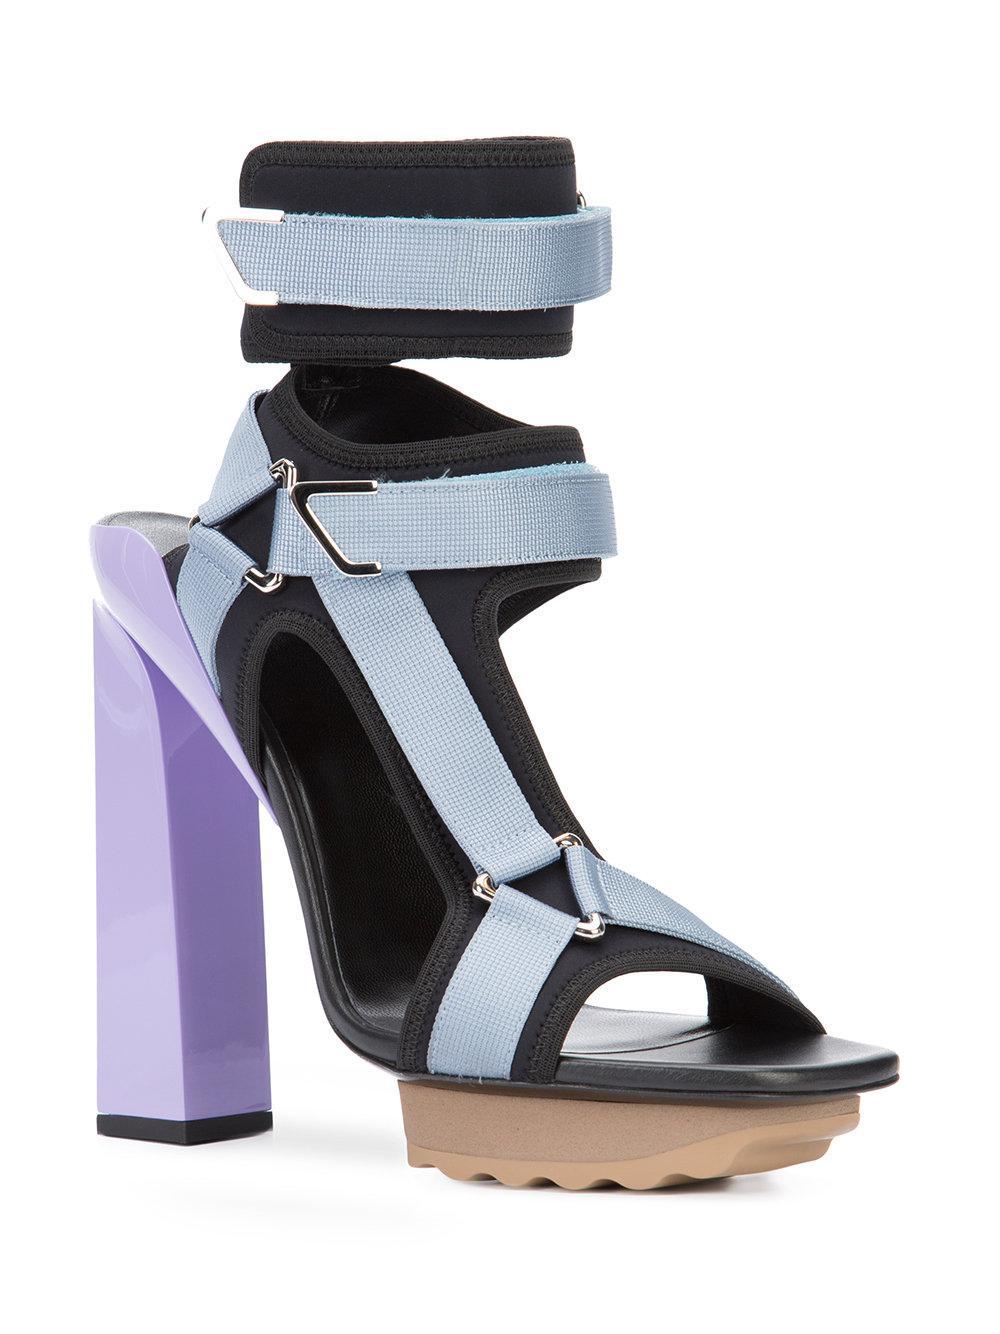 d857ea3530f Lyst - Versace T-bar Platform Sandals in Black